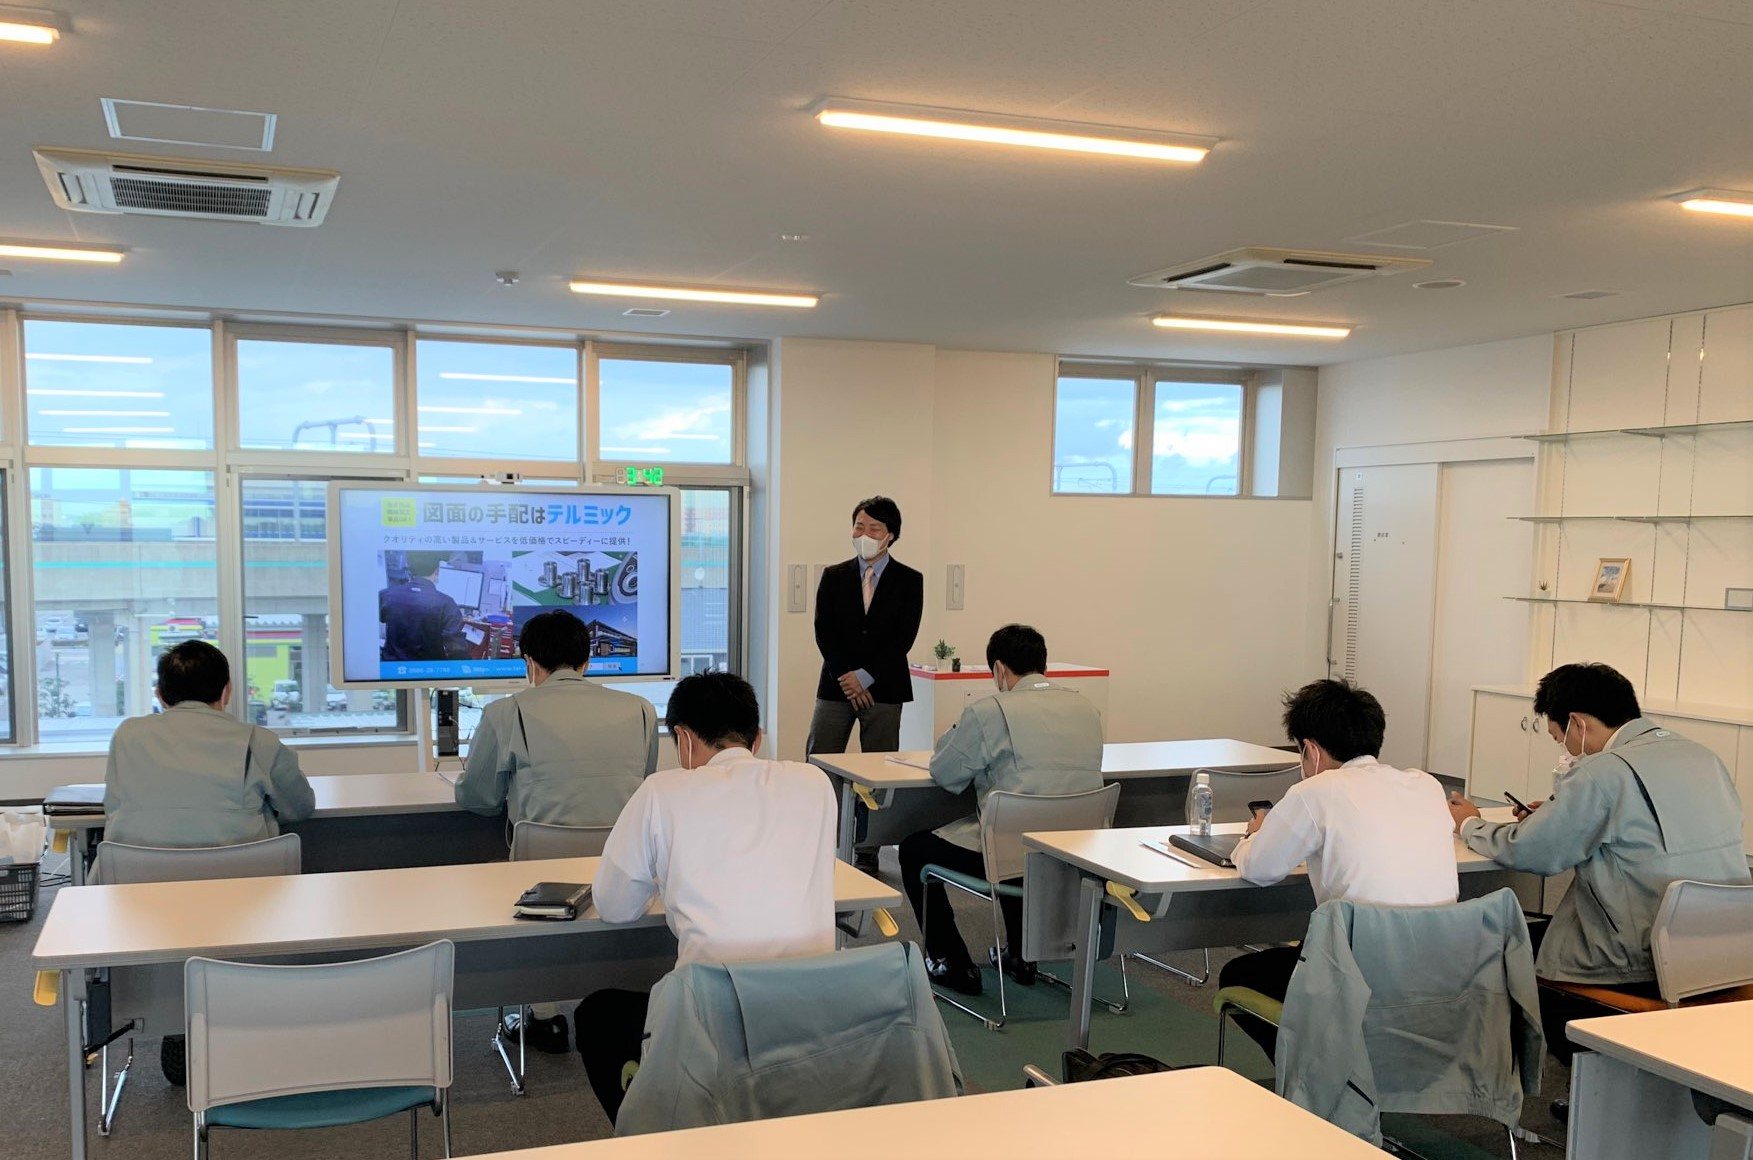 第3回 ~テルミック工場見学会/勉強会開催~